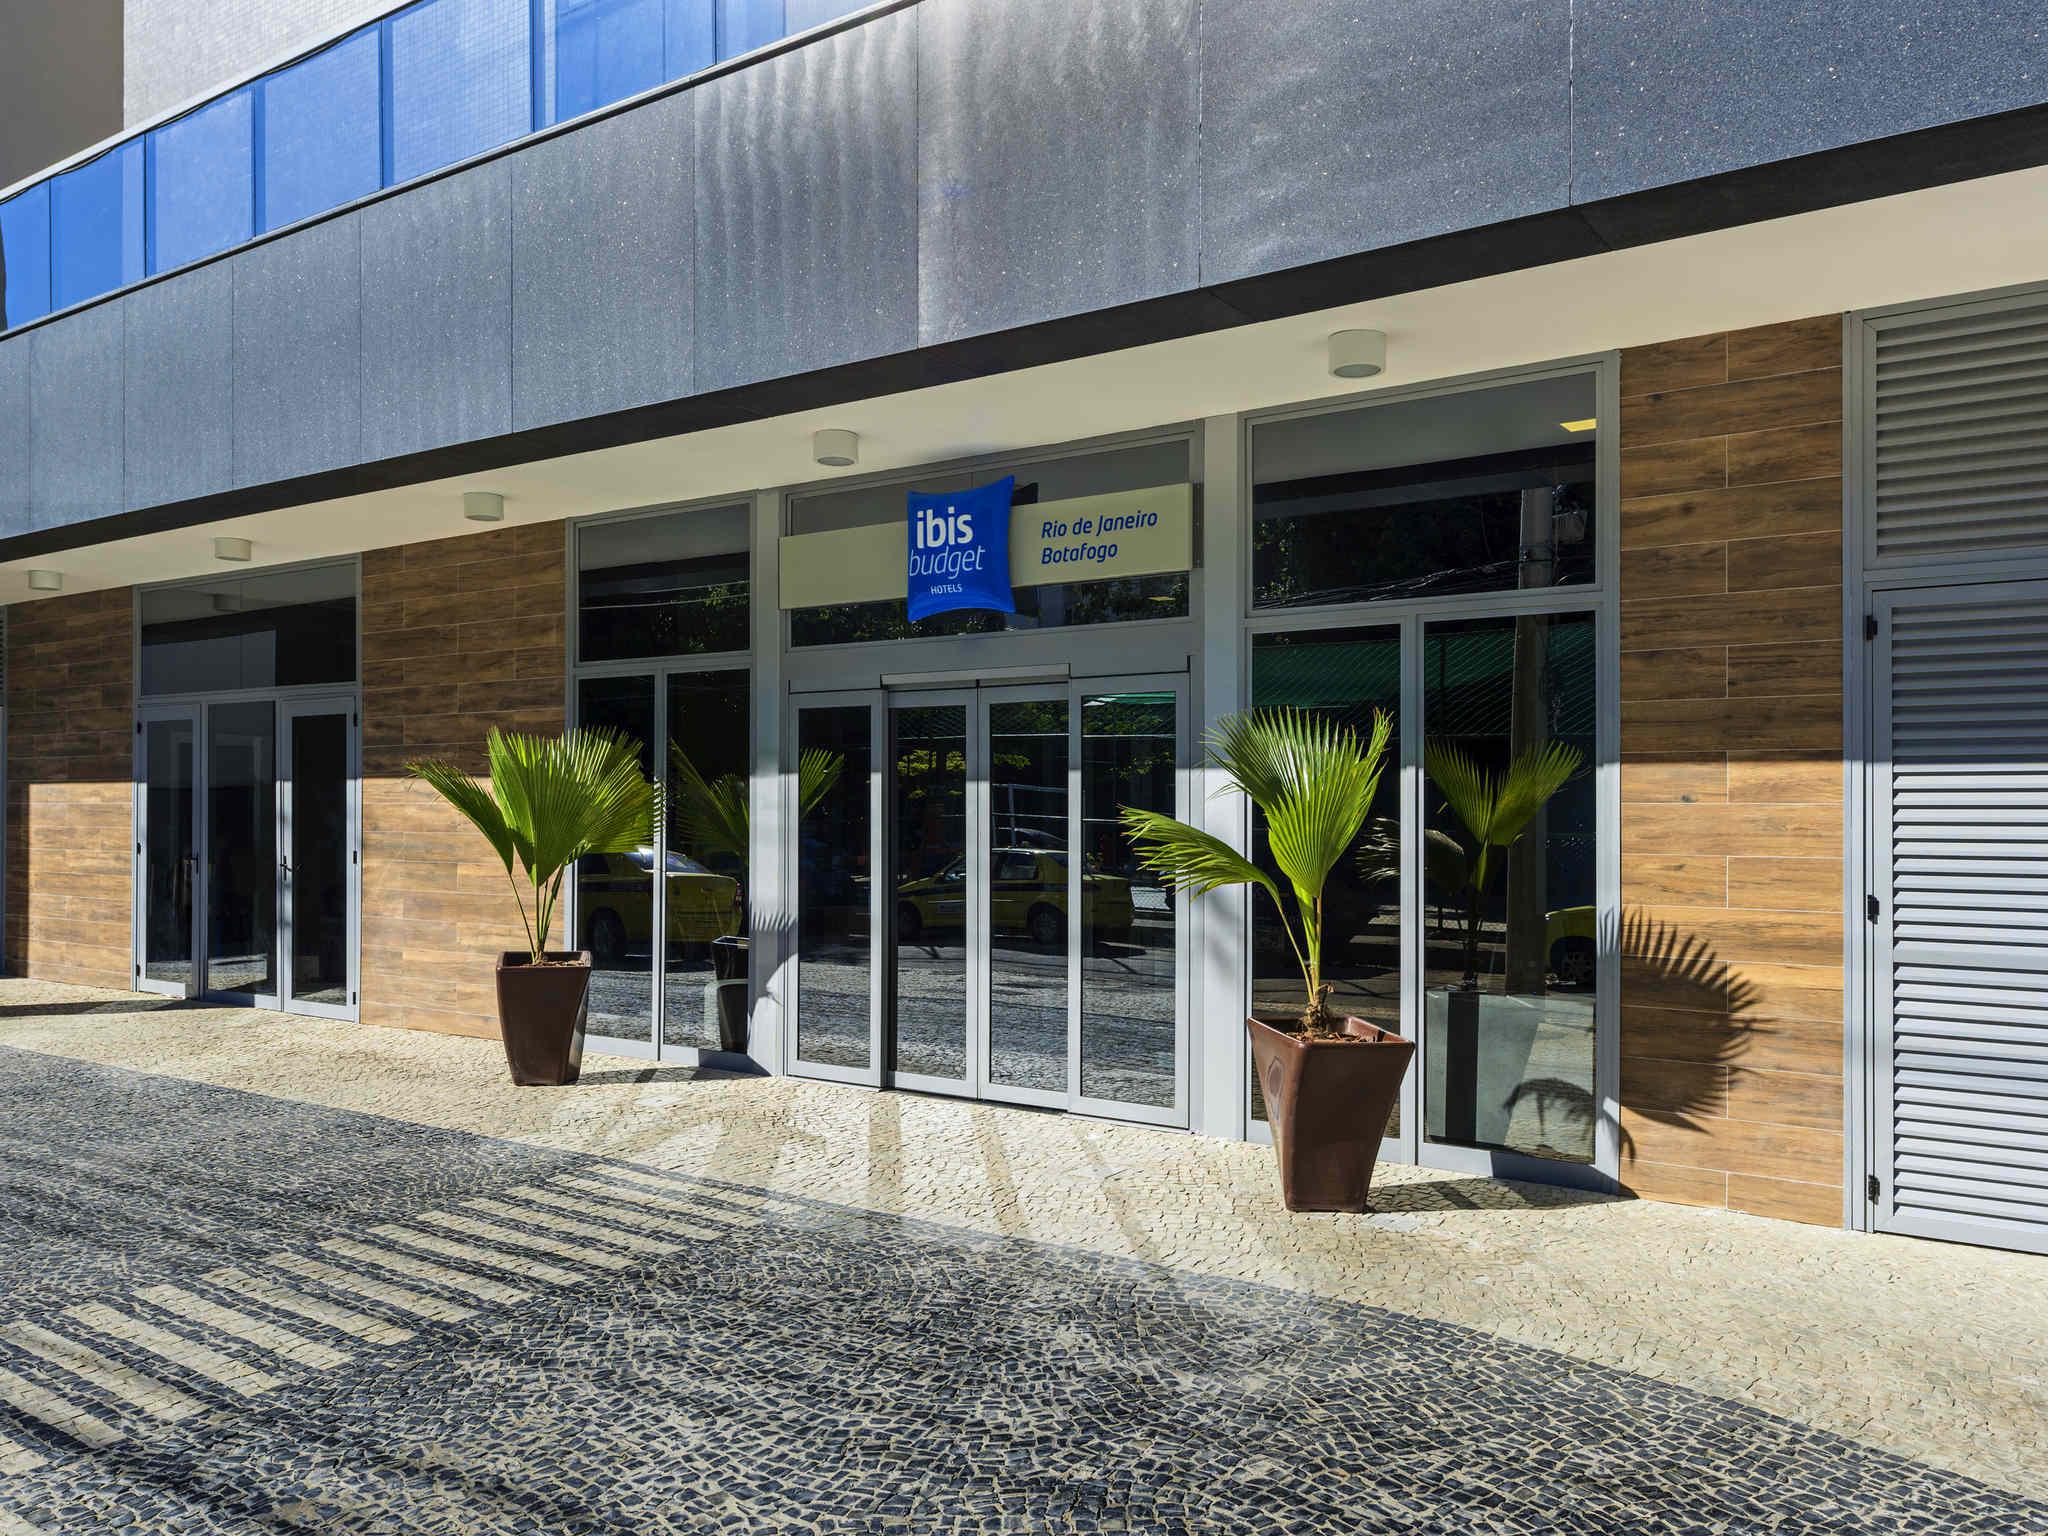 Hotel - ibis budget RJ Botafogo